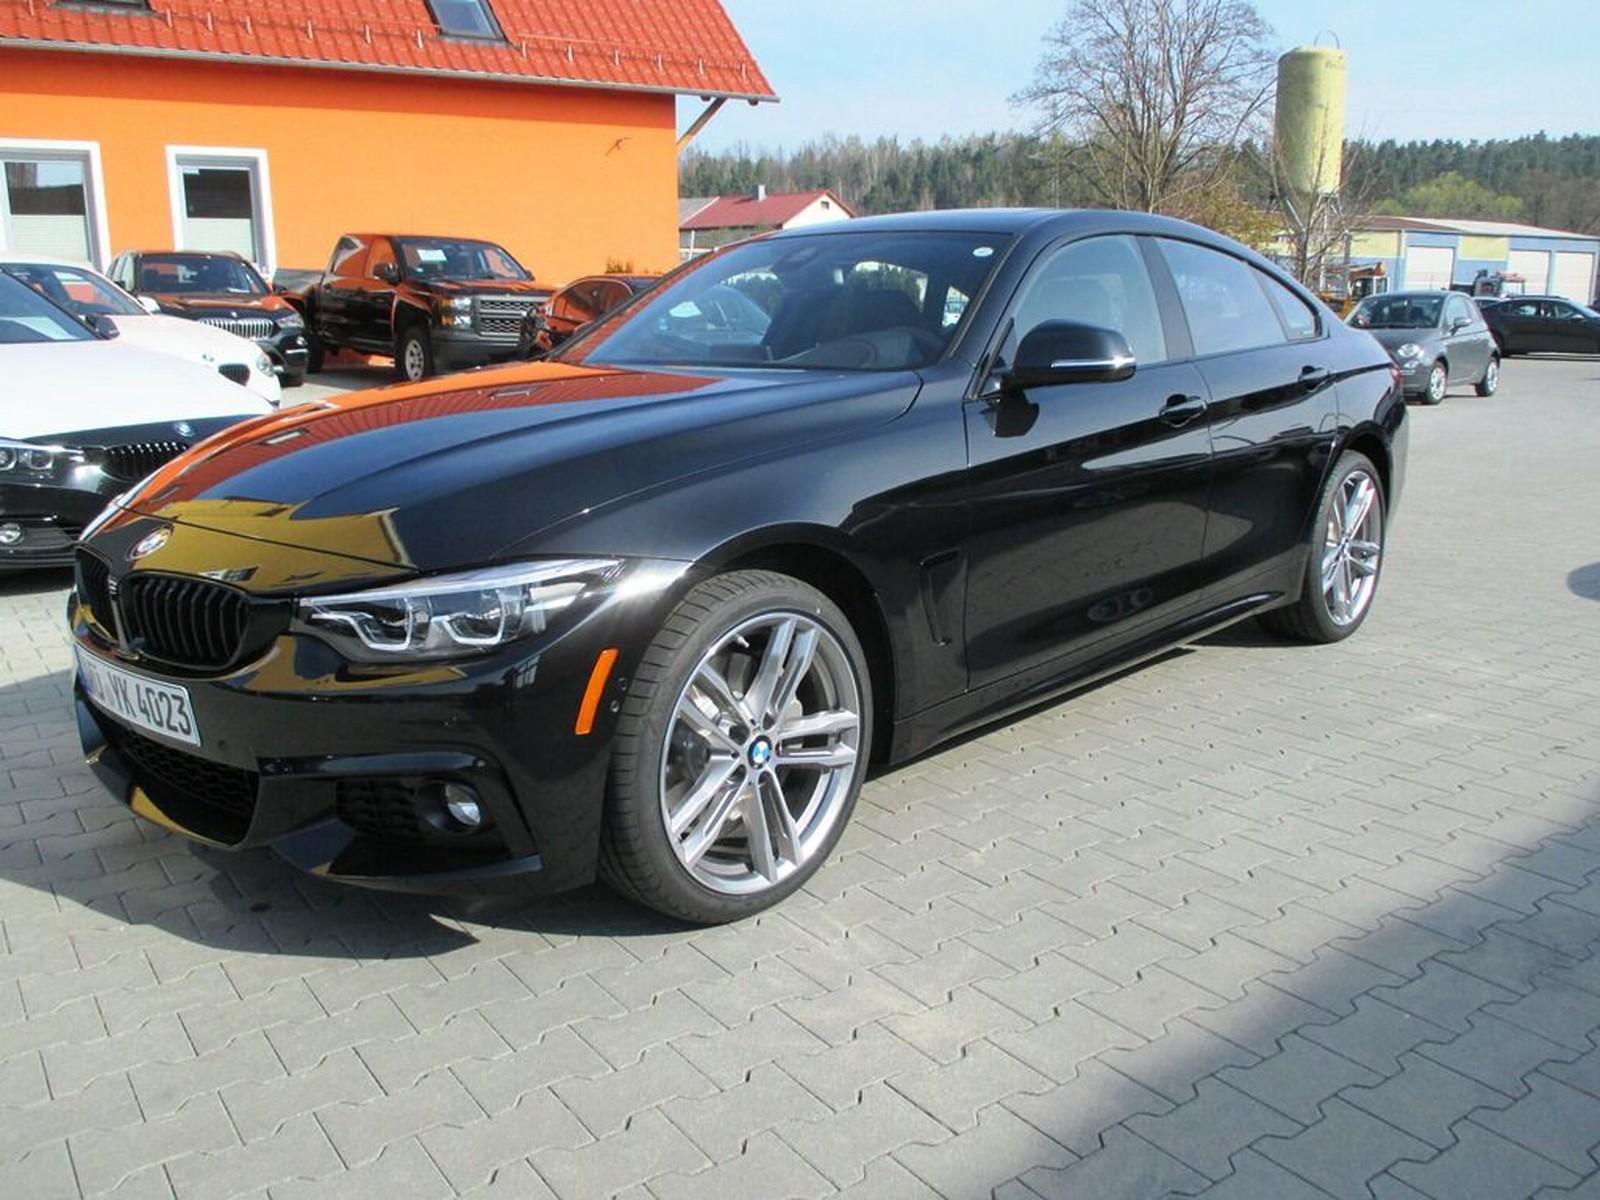 Bmw 430 I Xdrive Gran Coupe M Sport Tax Free Military Sales In Grafenwöhr Price 42995 Usd Int Nr U 15491 Sold